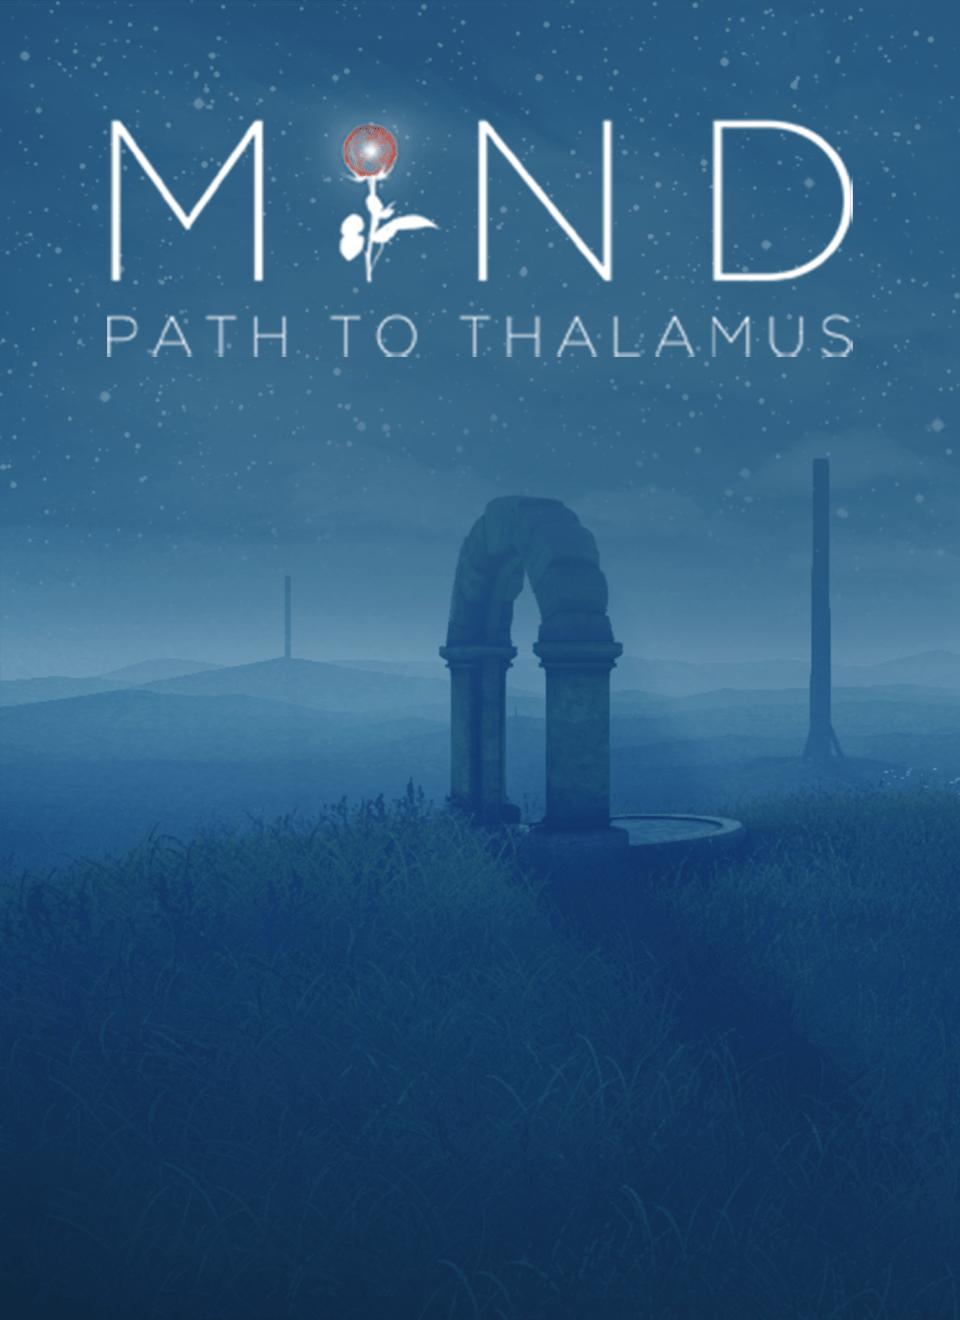 mind-path-to-thalamus_621103f1